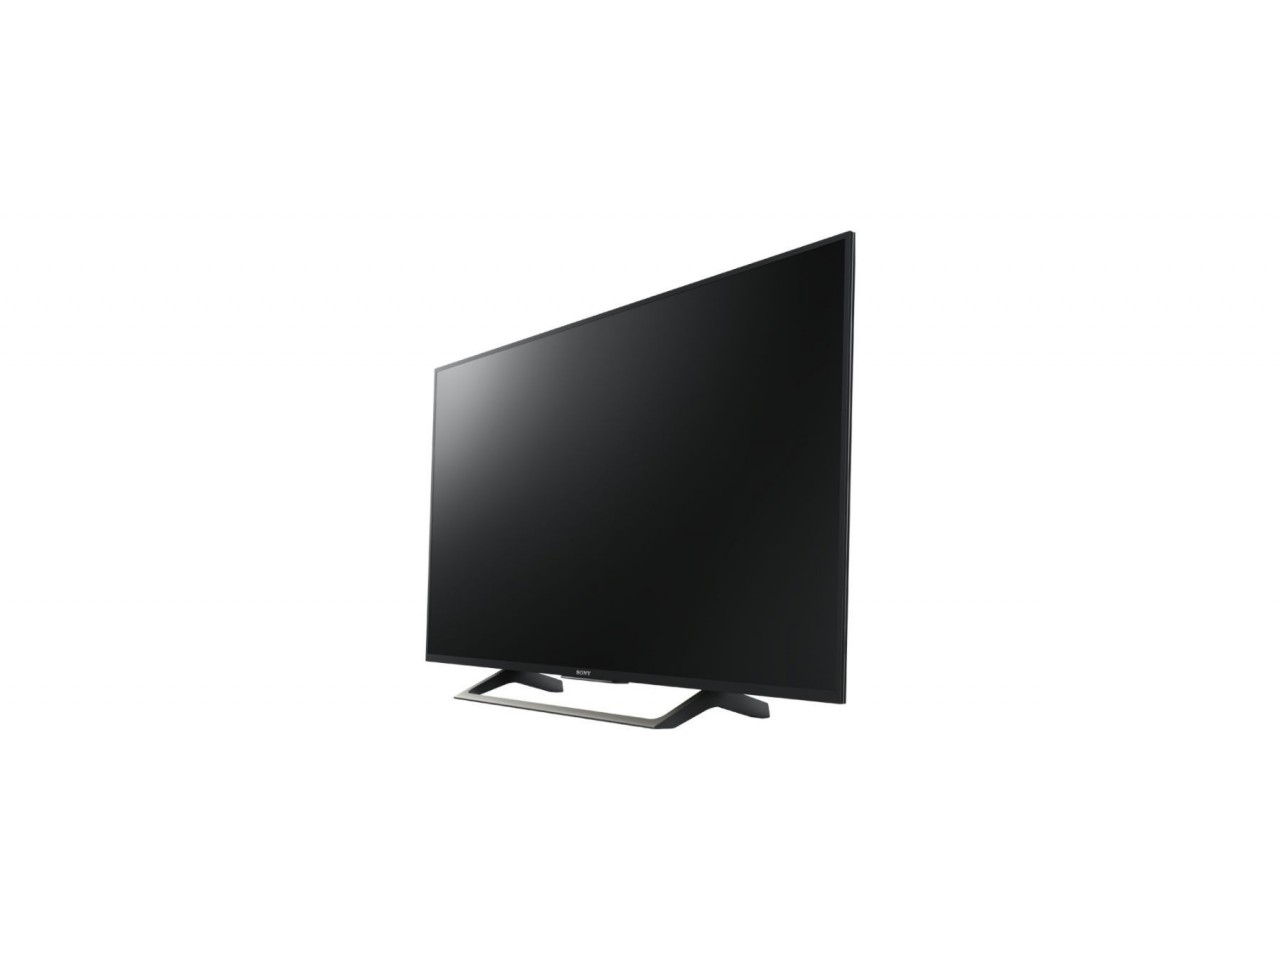 sony led smart tv 123 cm kd 49xe8099 android 4k ultra hd televizoare ultra hd sony. Black Bedroom Furniture Sets. Home Design Ideas